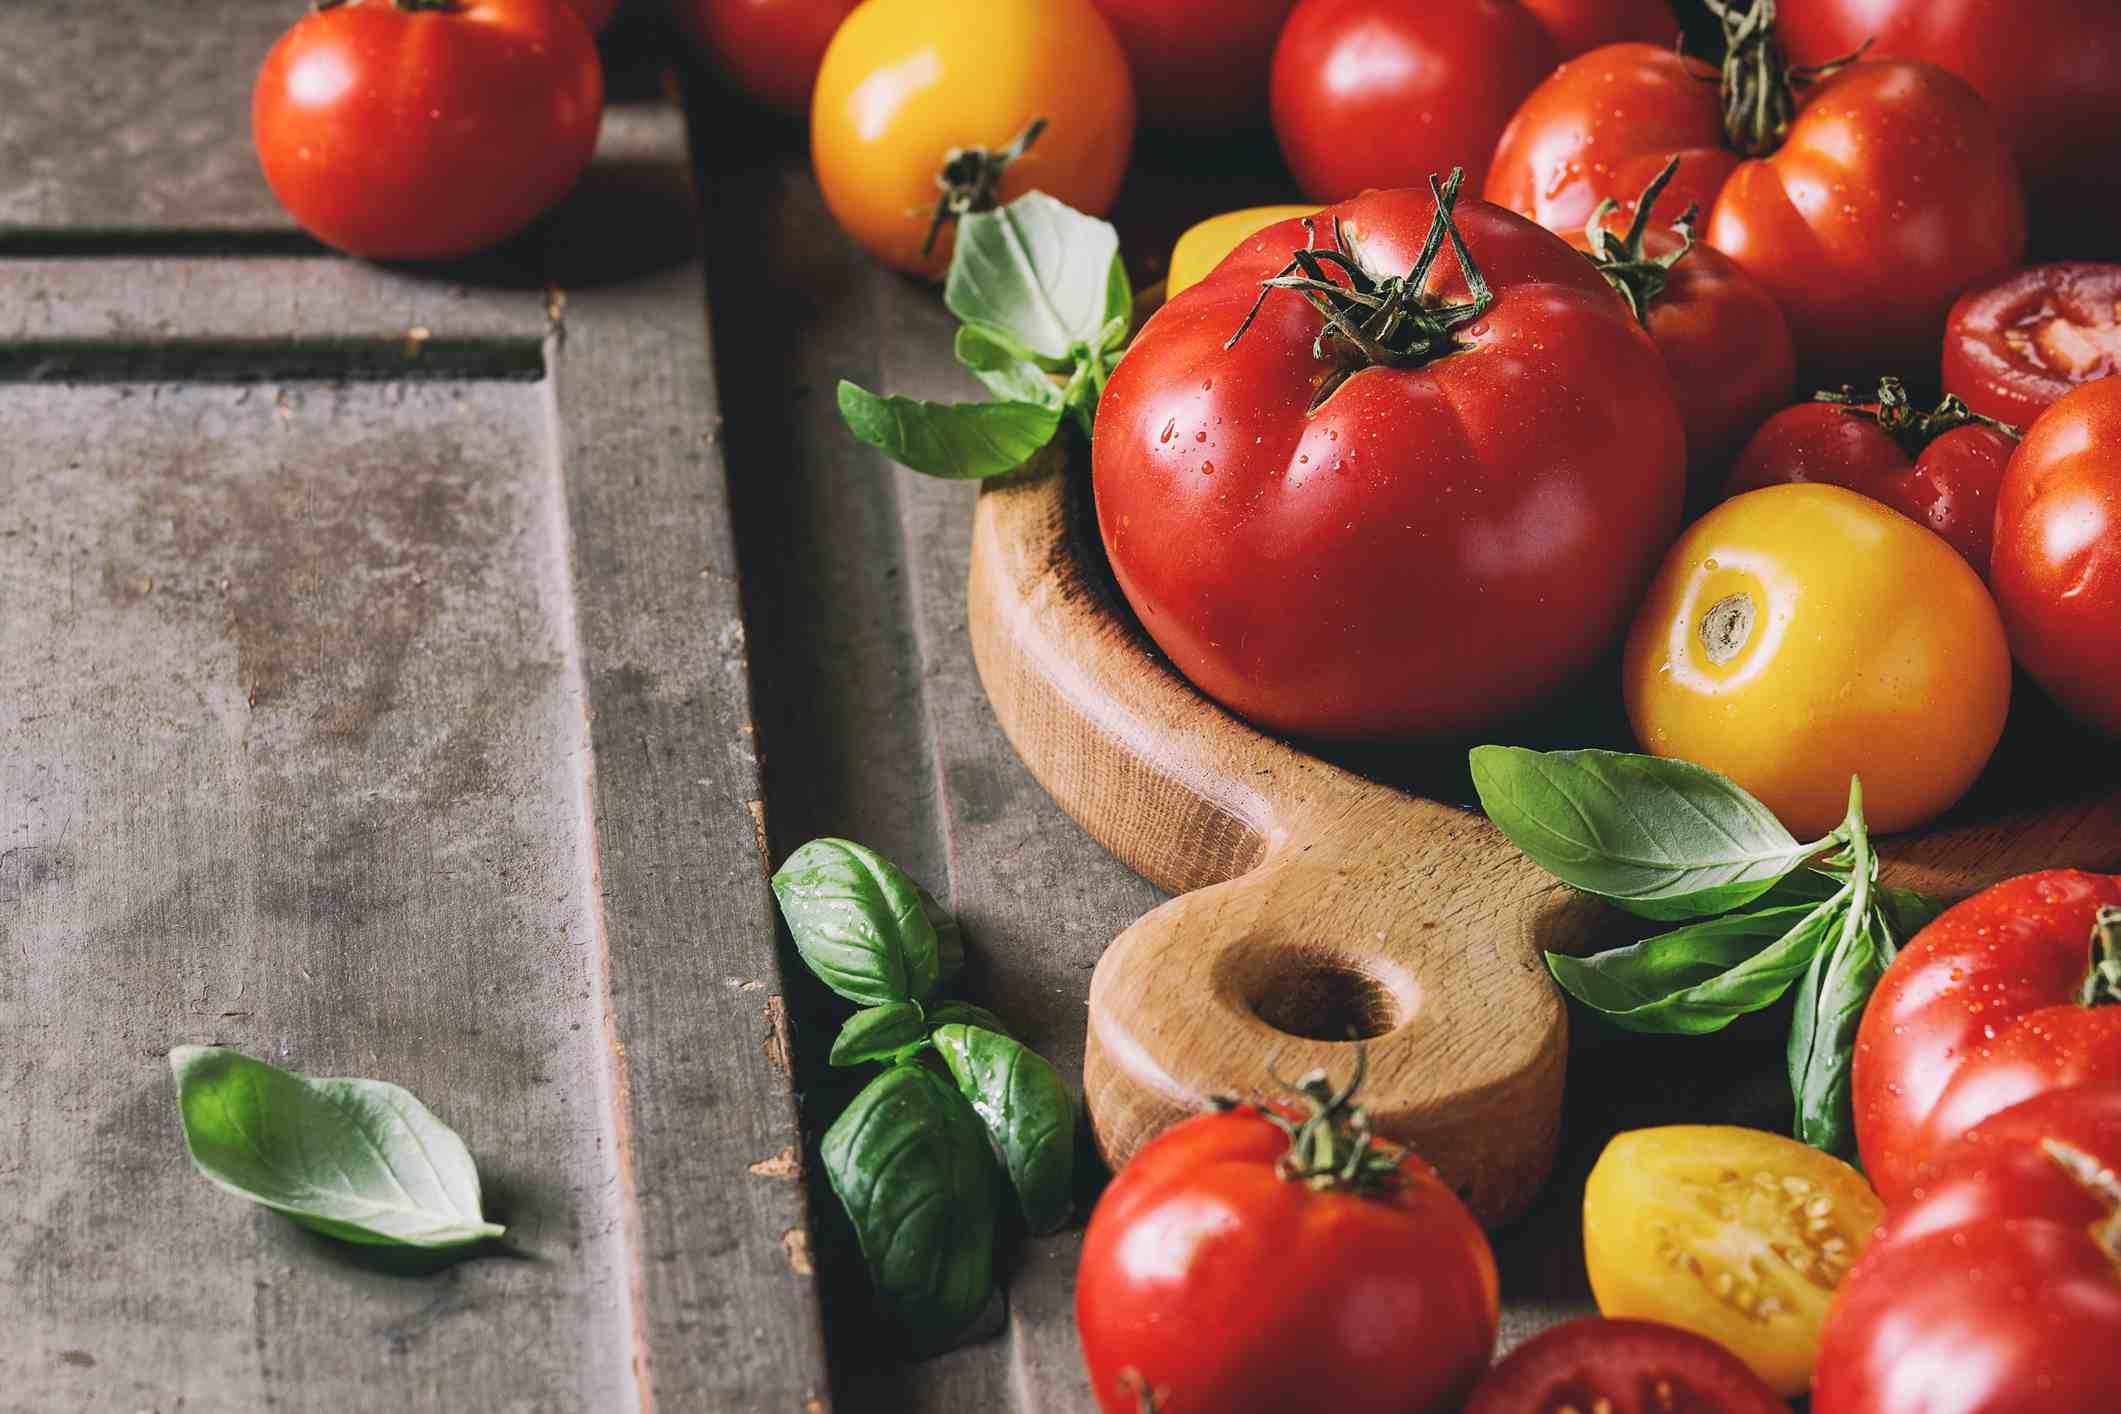 Ripe fresh tomatoes